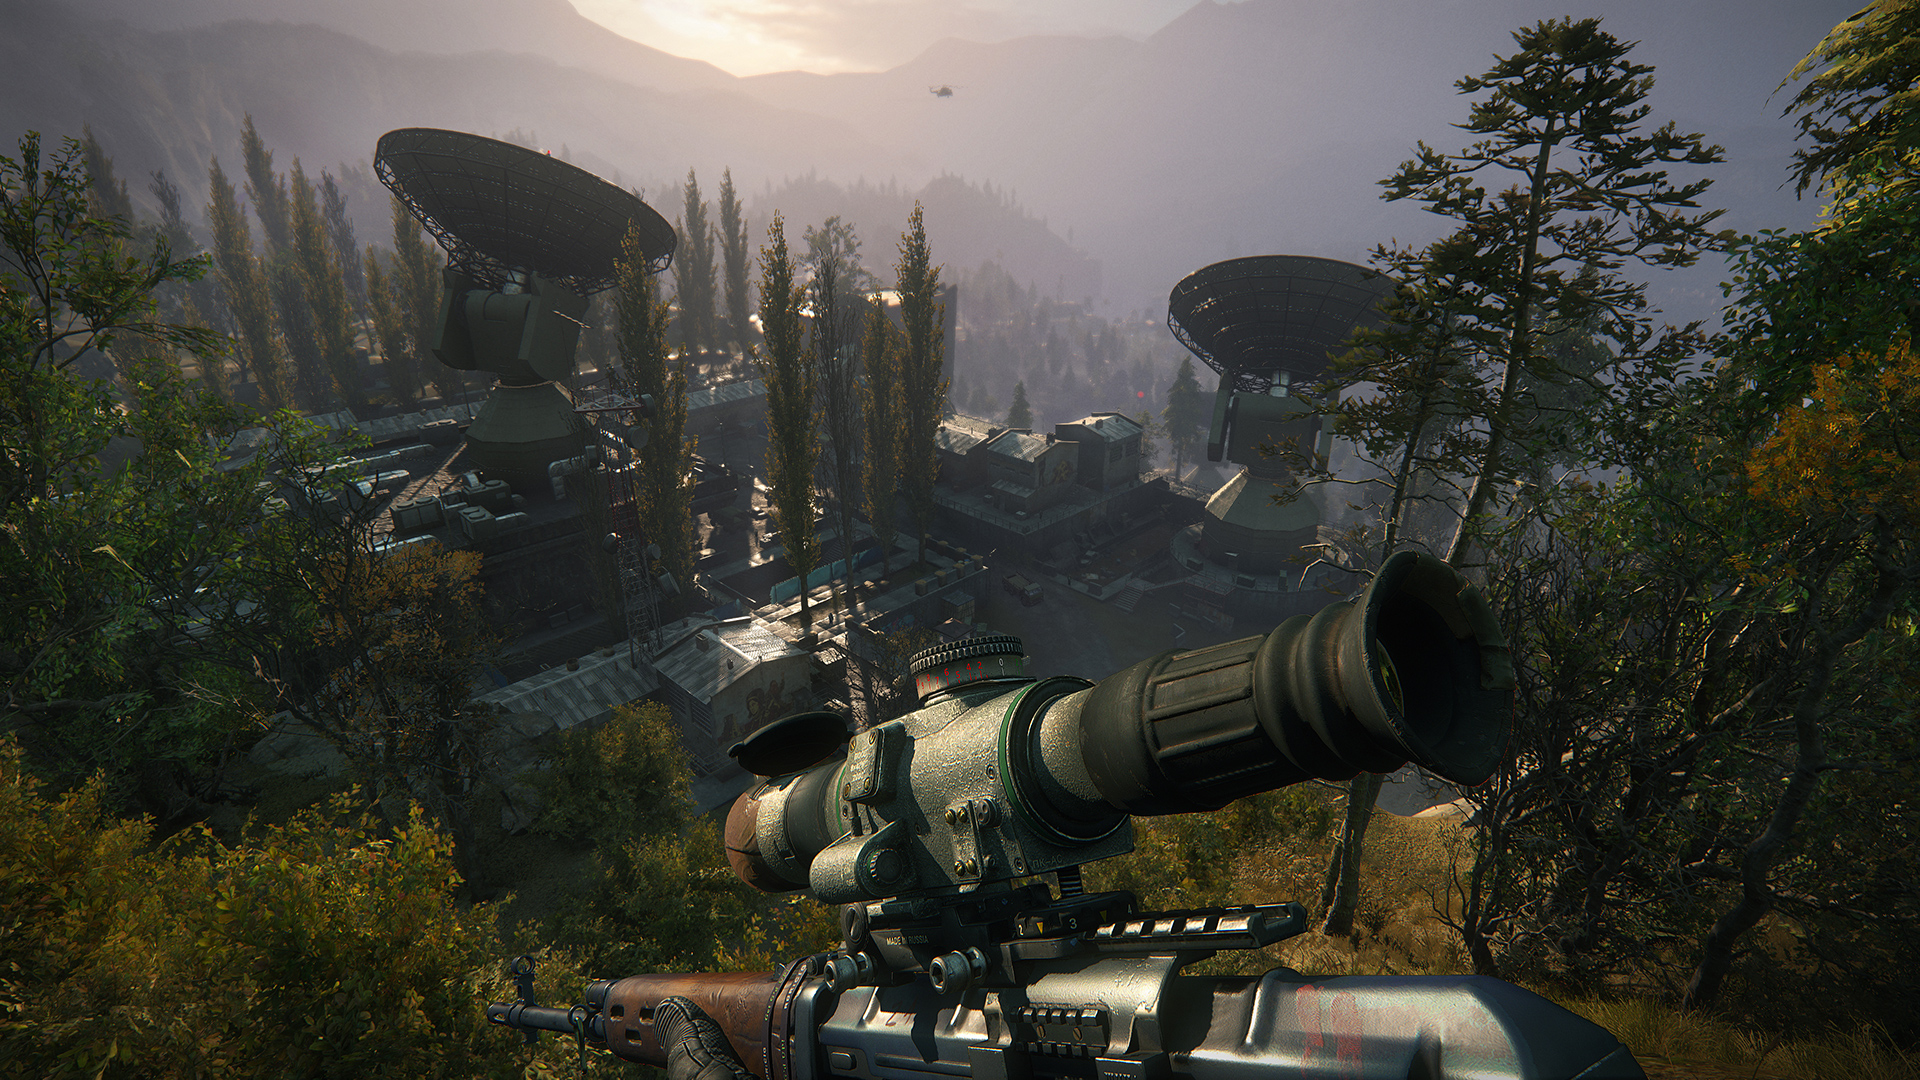 sniper ghost warrior crack only skidrow keygen pc game